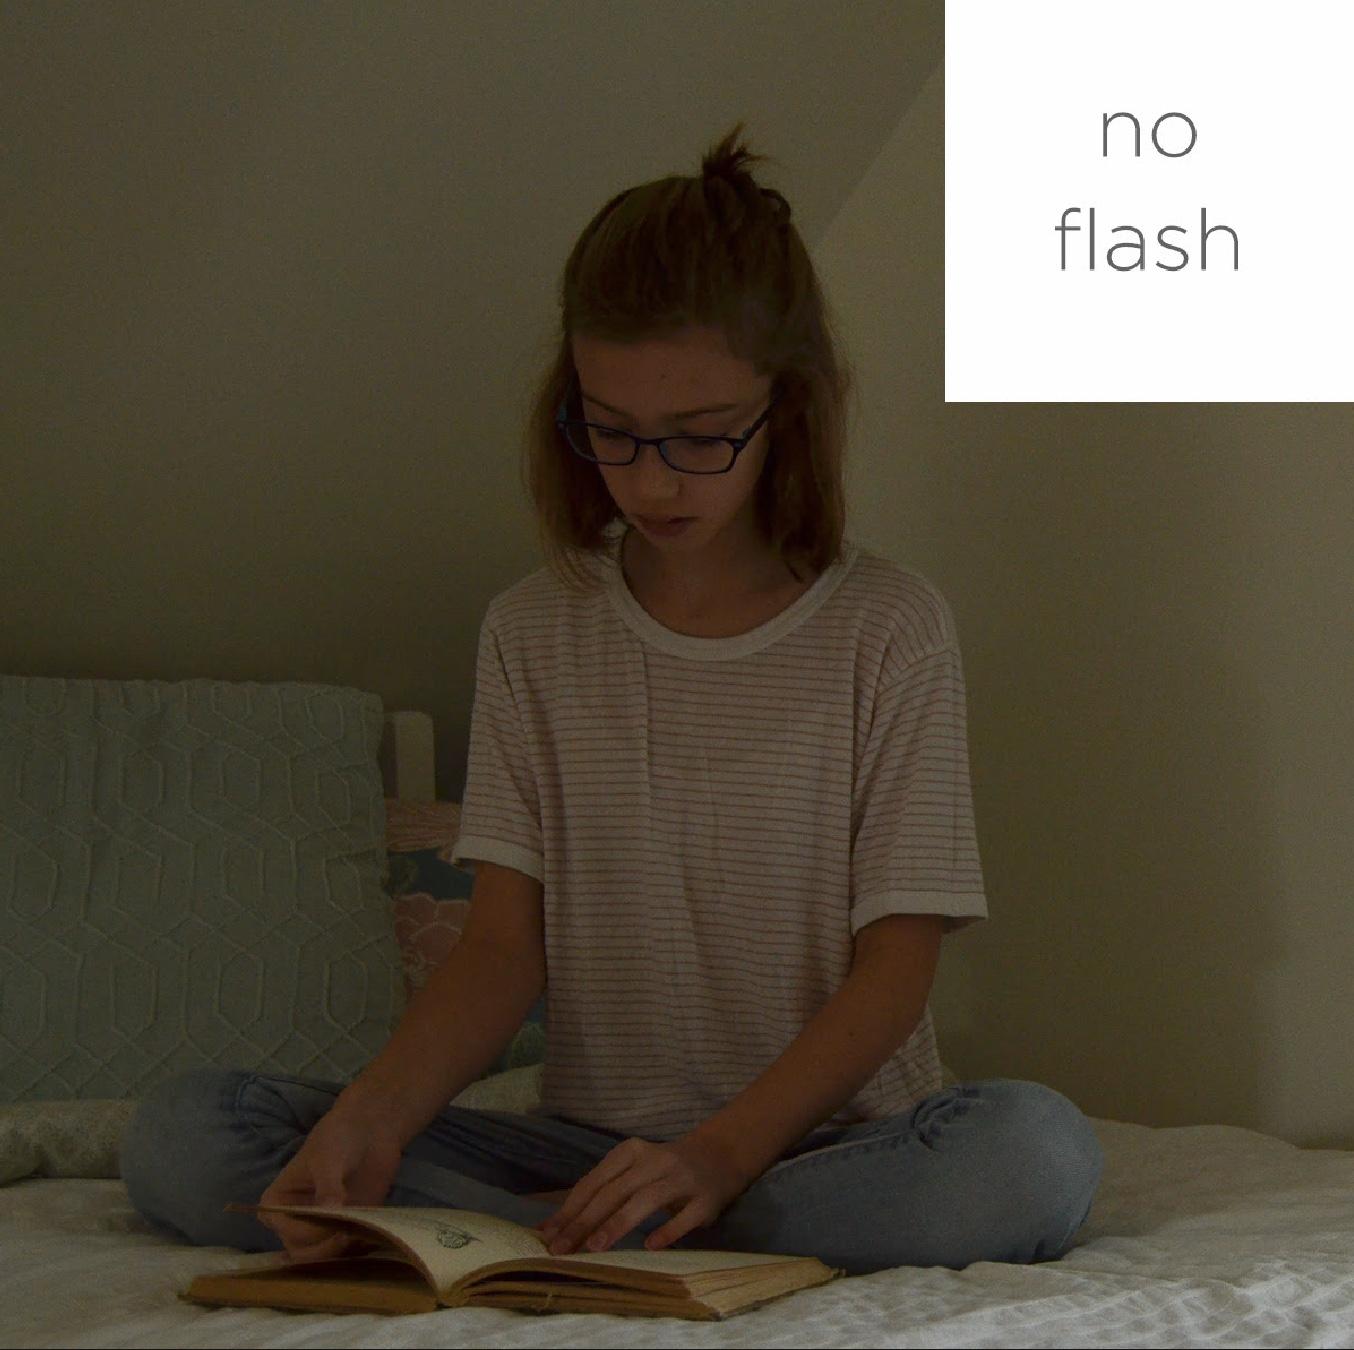 flash - 1.jpeg